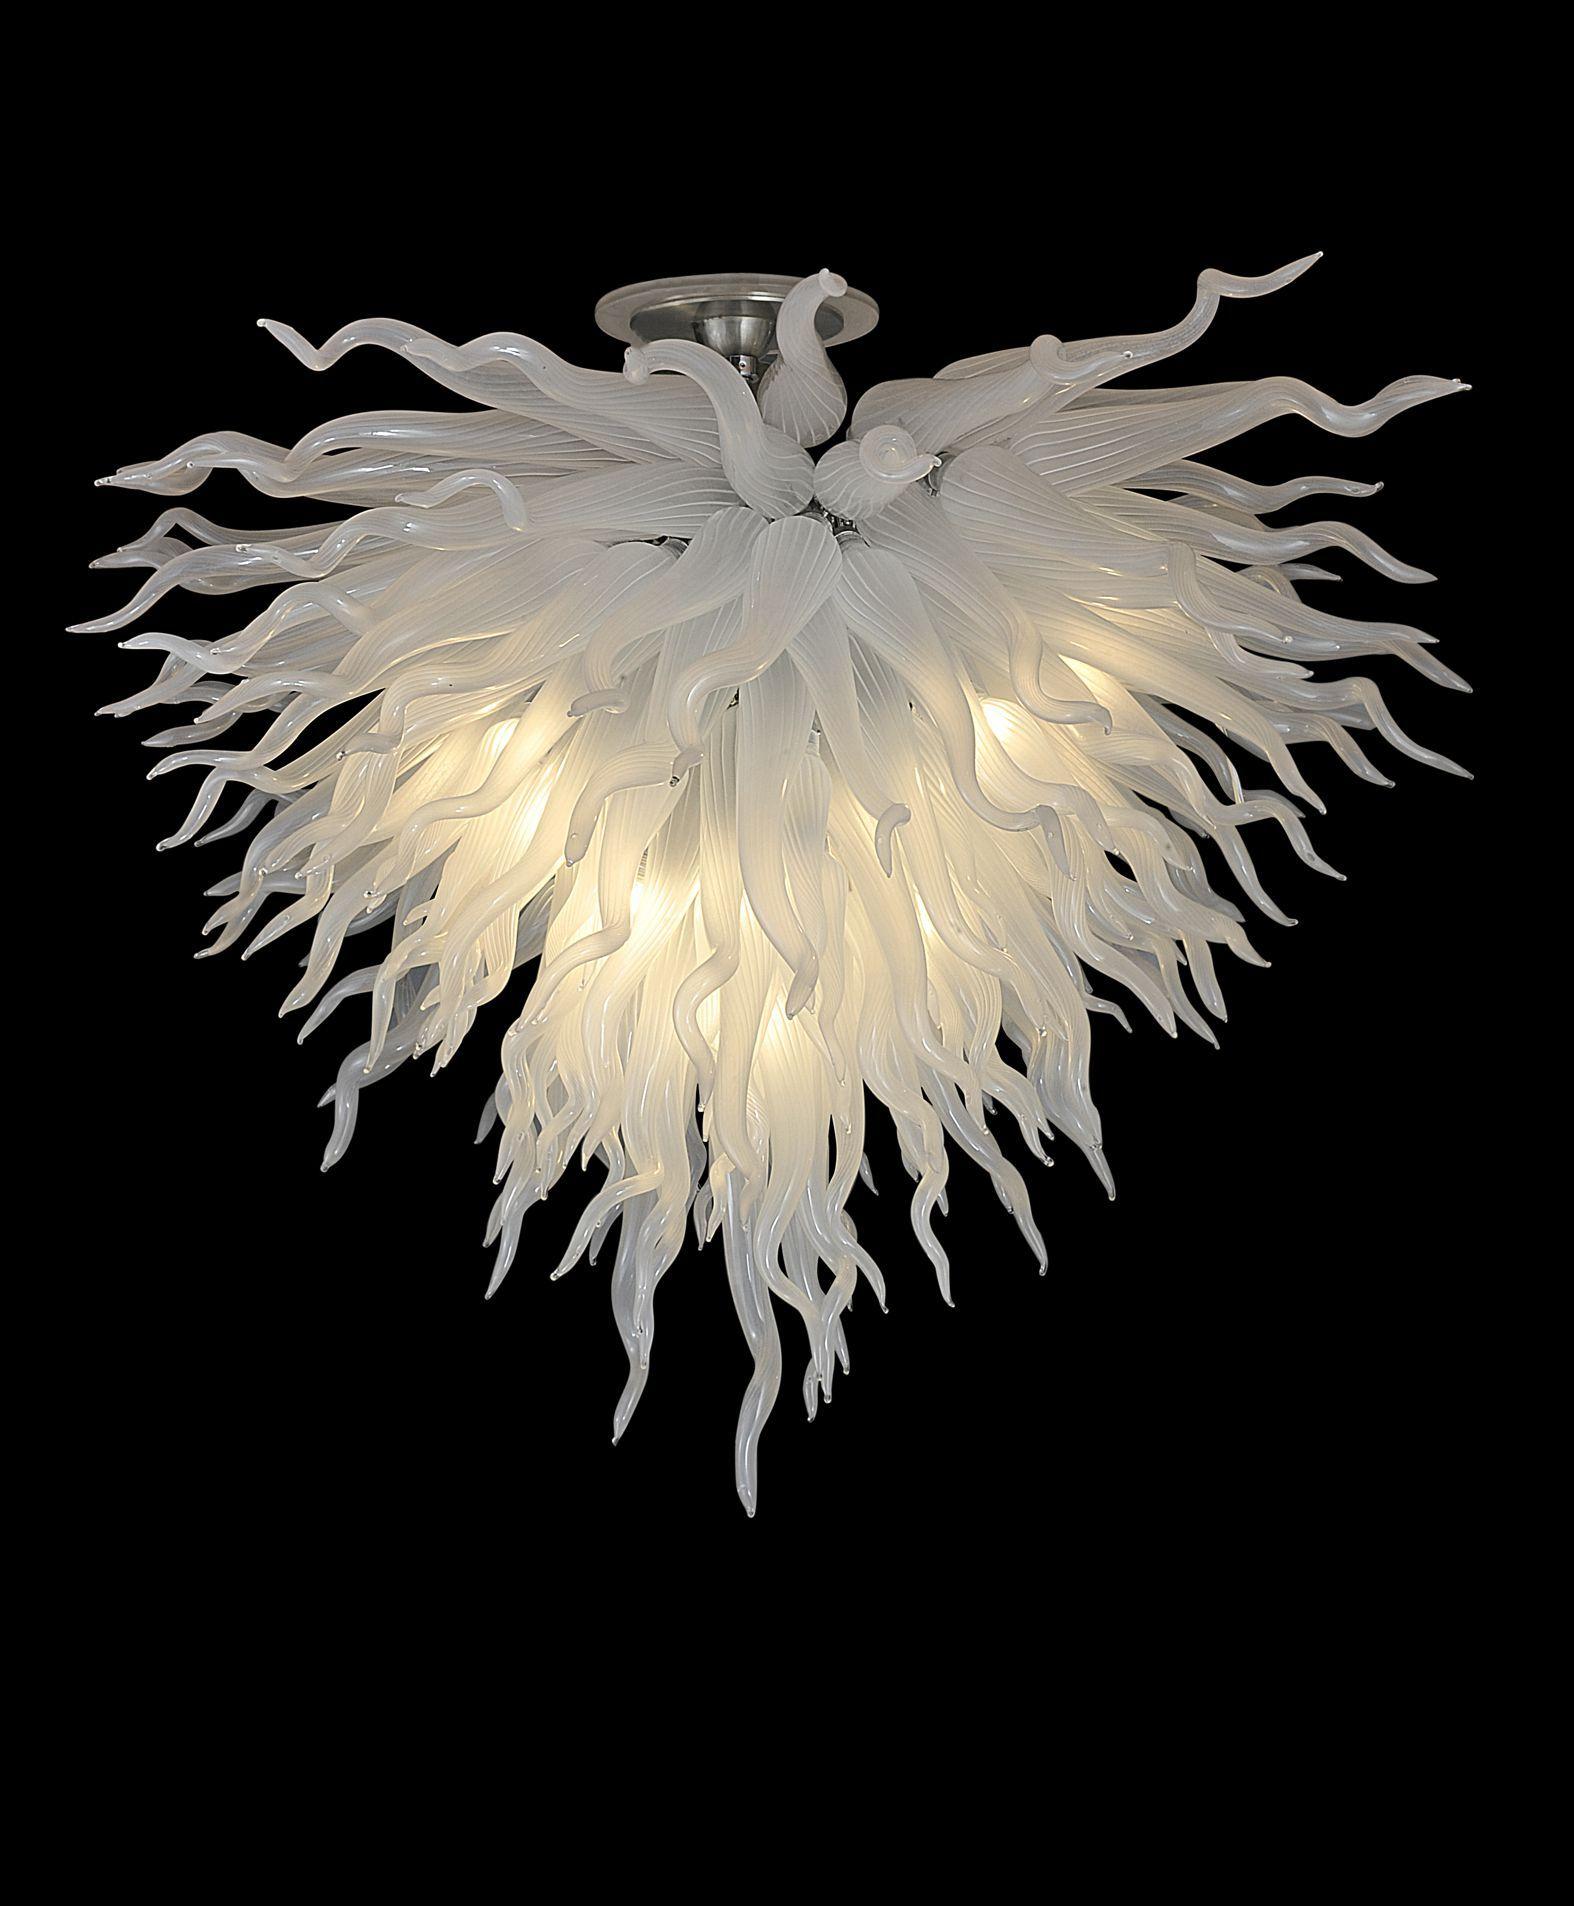 Corale bianco murano glass s u b l i m e pinterest home bespoke italian chandeliers hand blown glass lighting modern contemporary designer chandeliers uk aloadofball Gallery